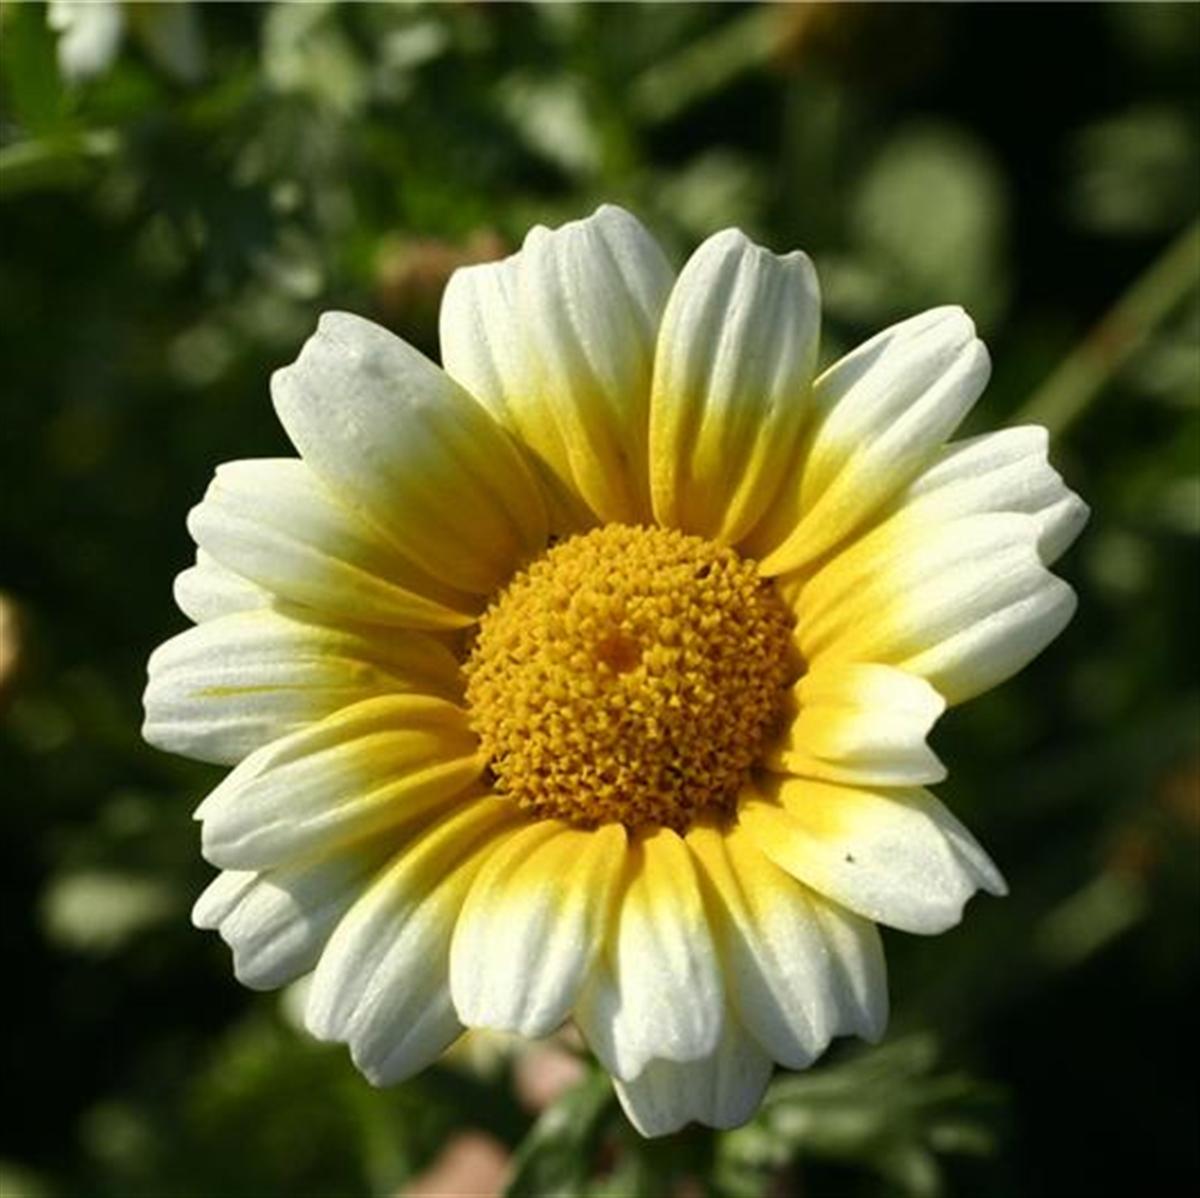 I-Autre-3353_1200x1200-chrysantheme-comestible-ab.net.jpg